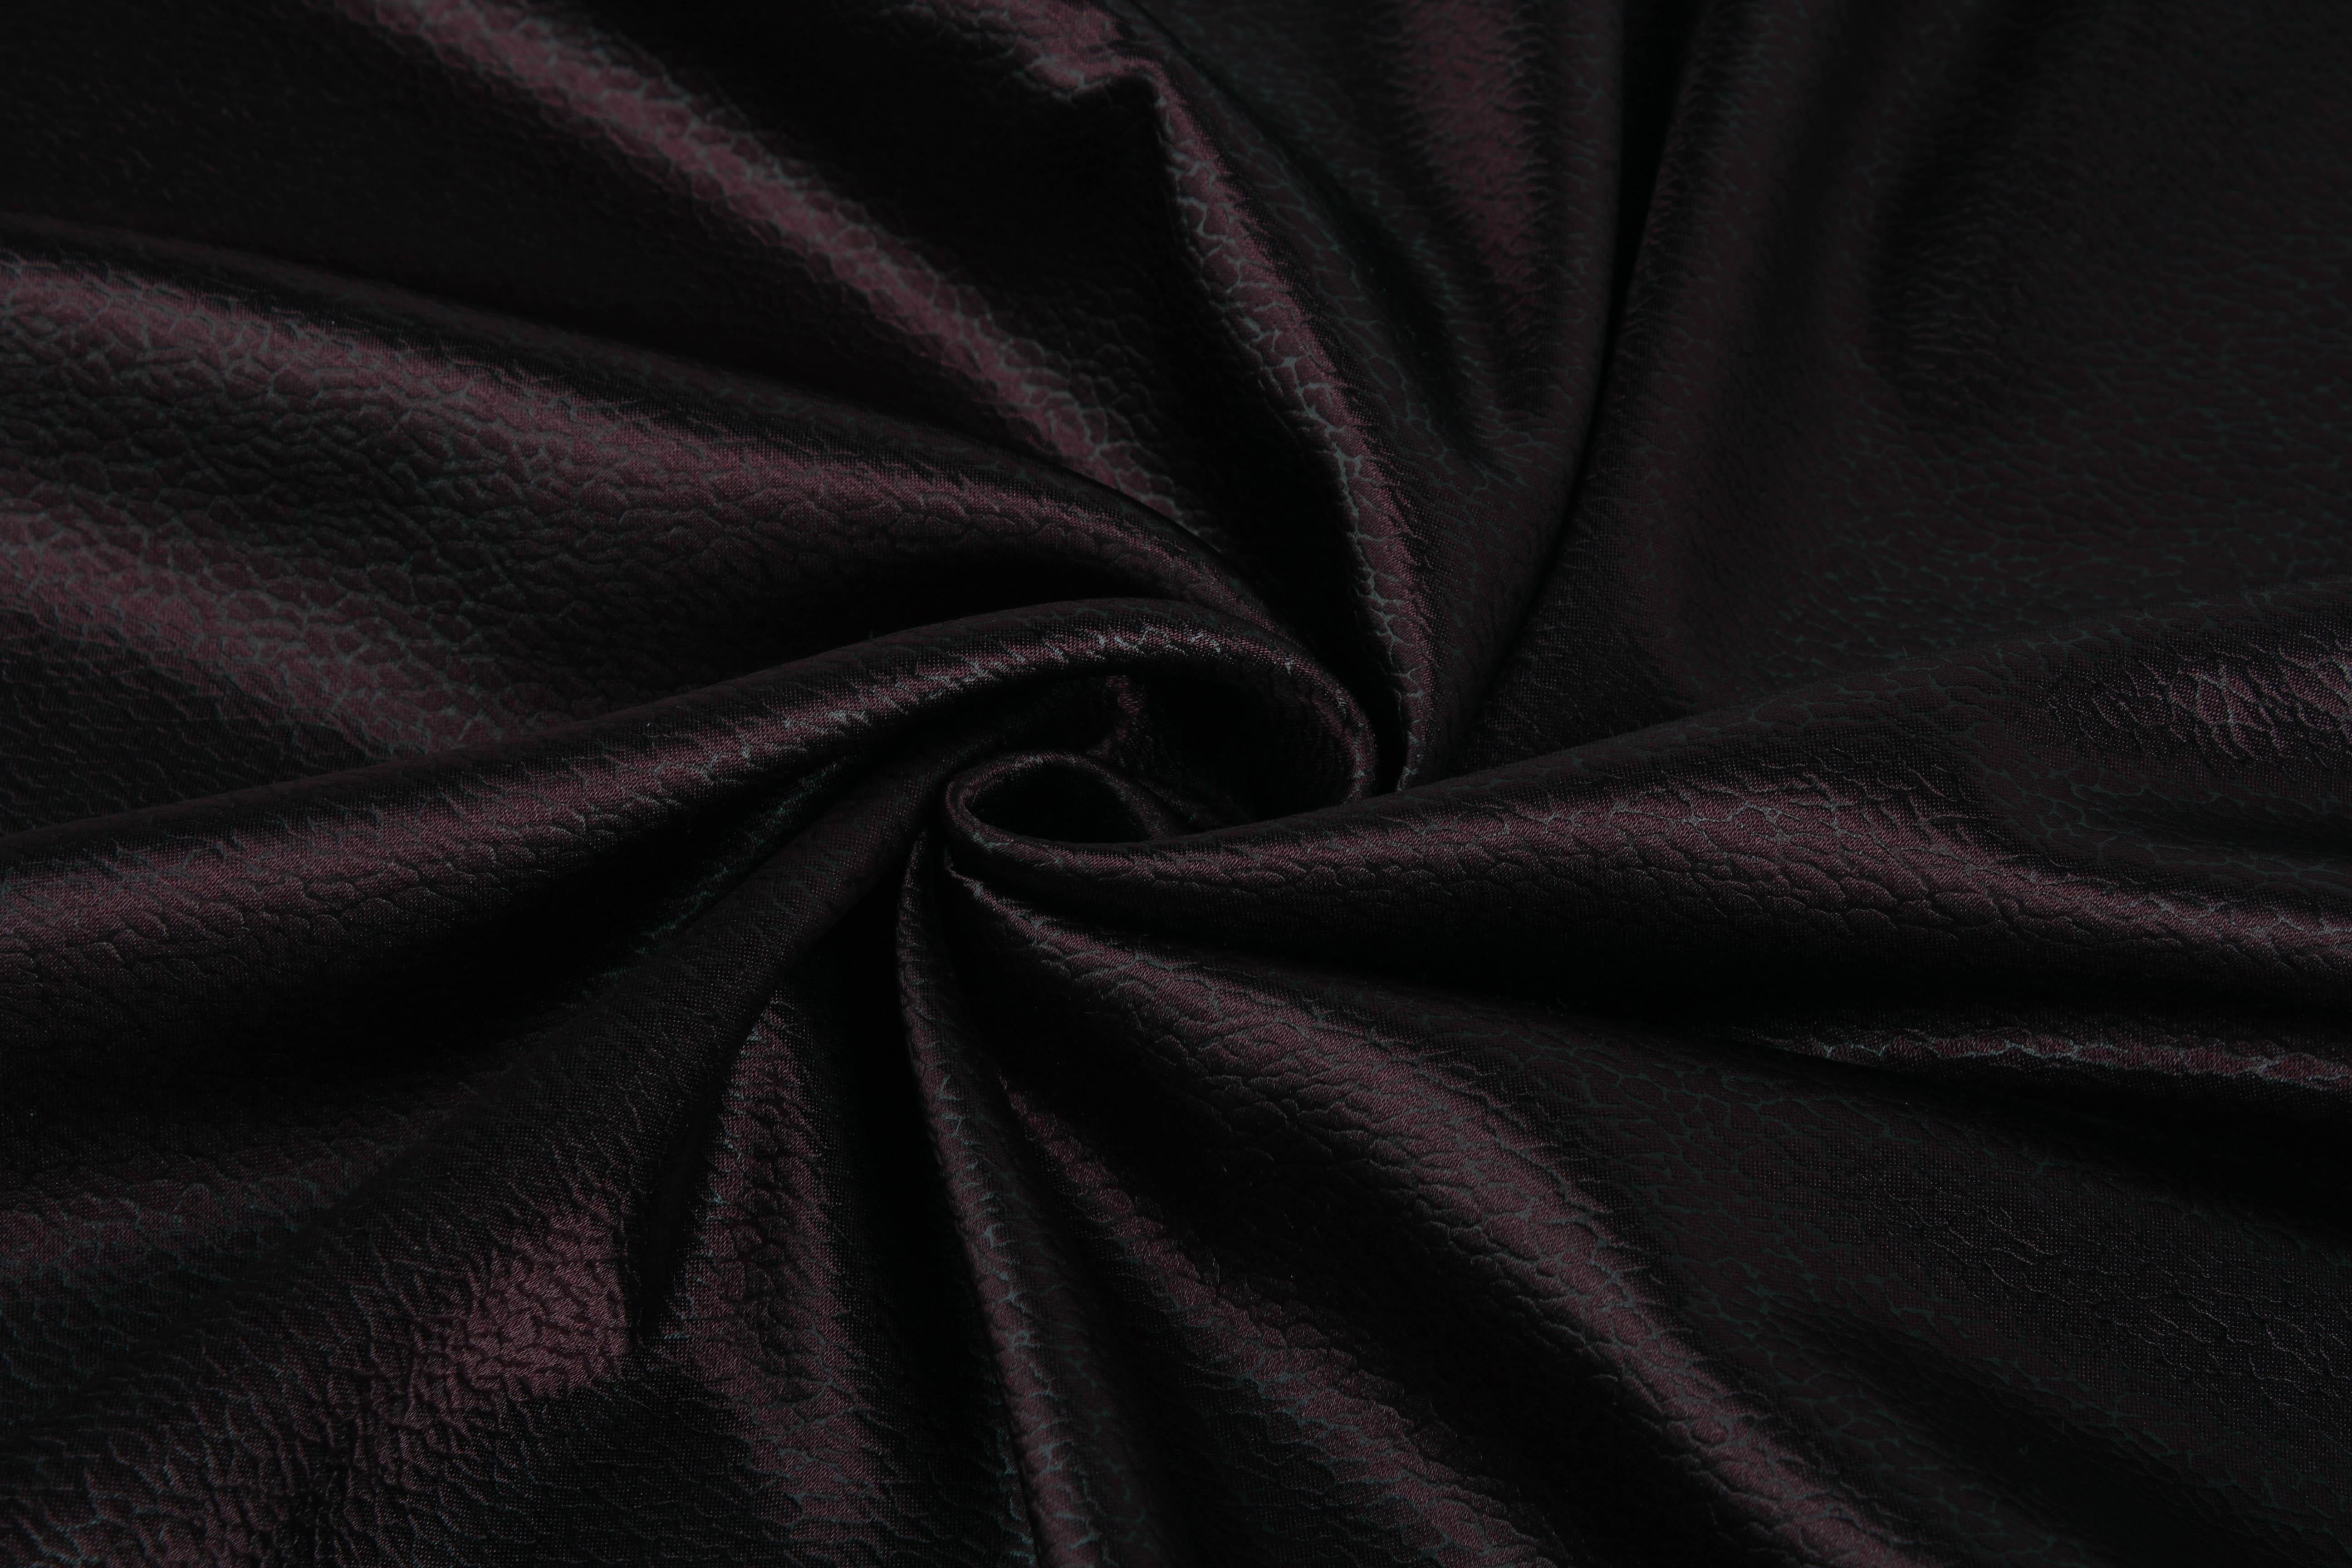 {} TexRepublic Материал Сатен Silk Цвет: Венге texrepublic материал бархат wet silk цвет брусника